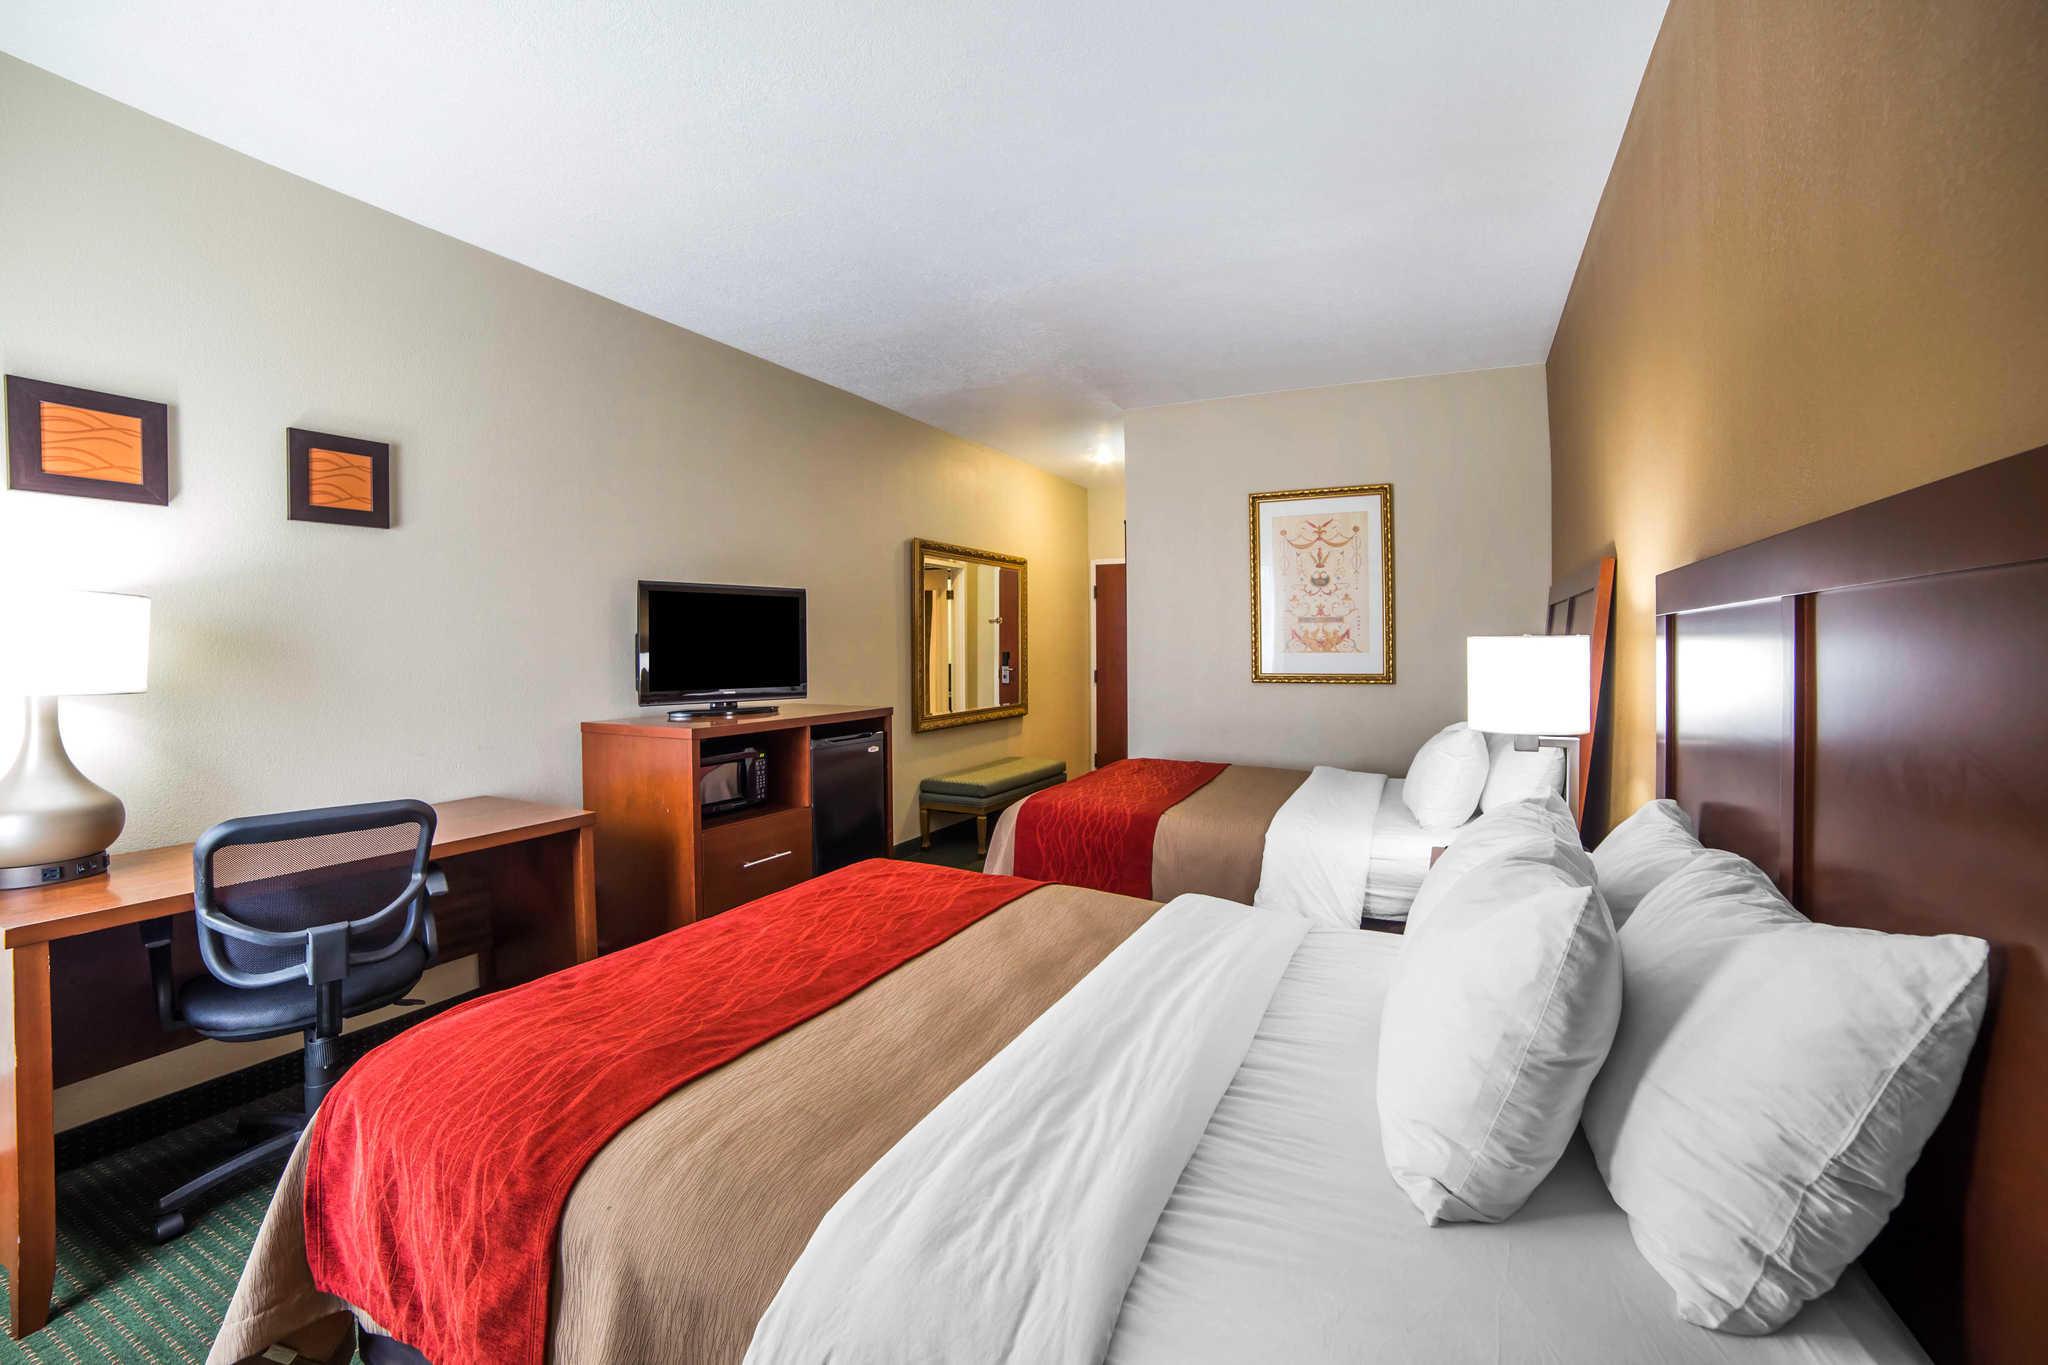 Quality Inn image 10